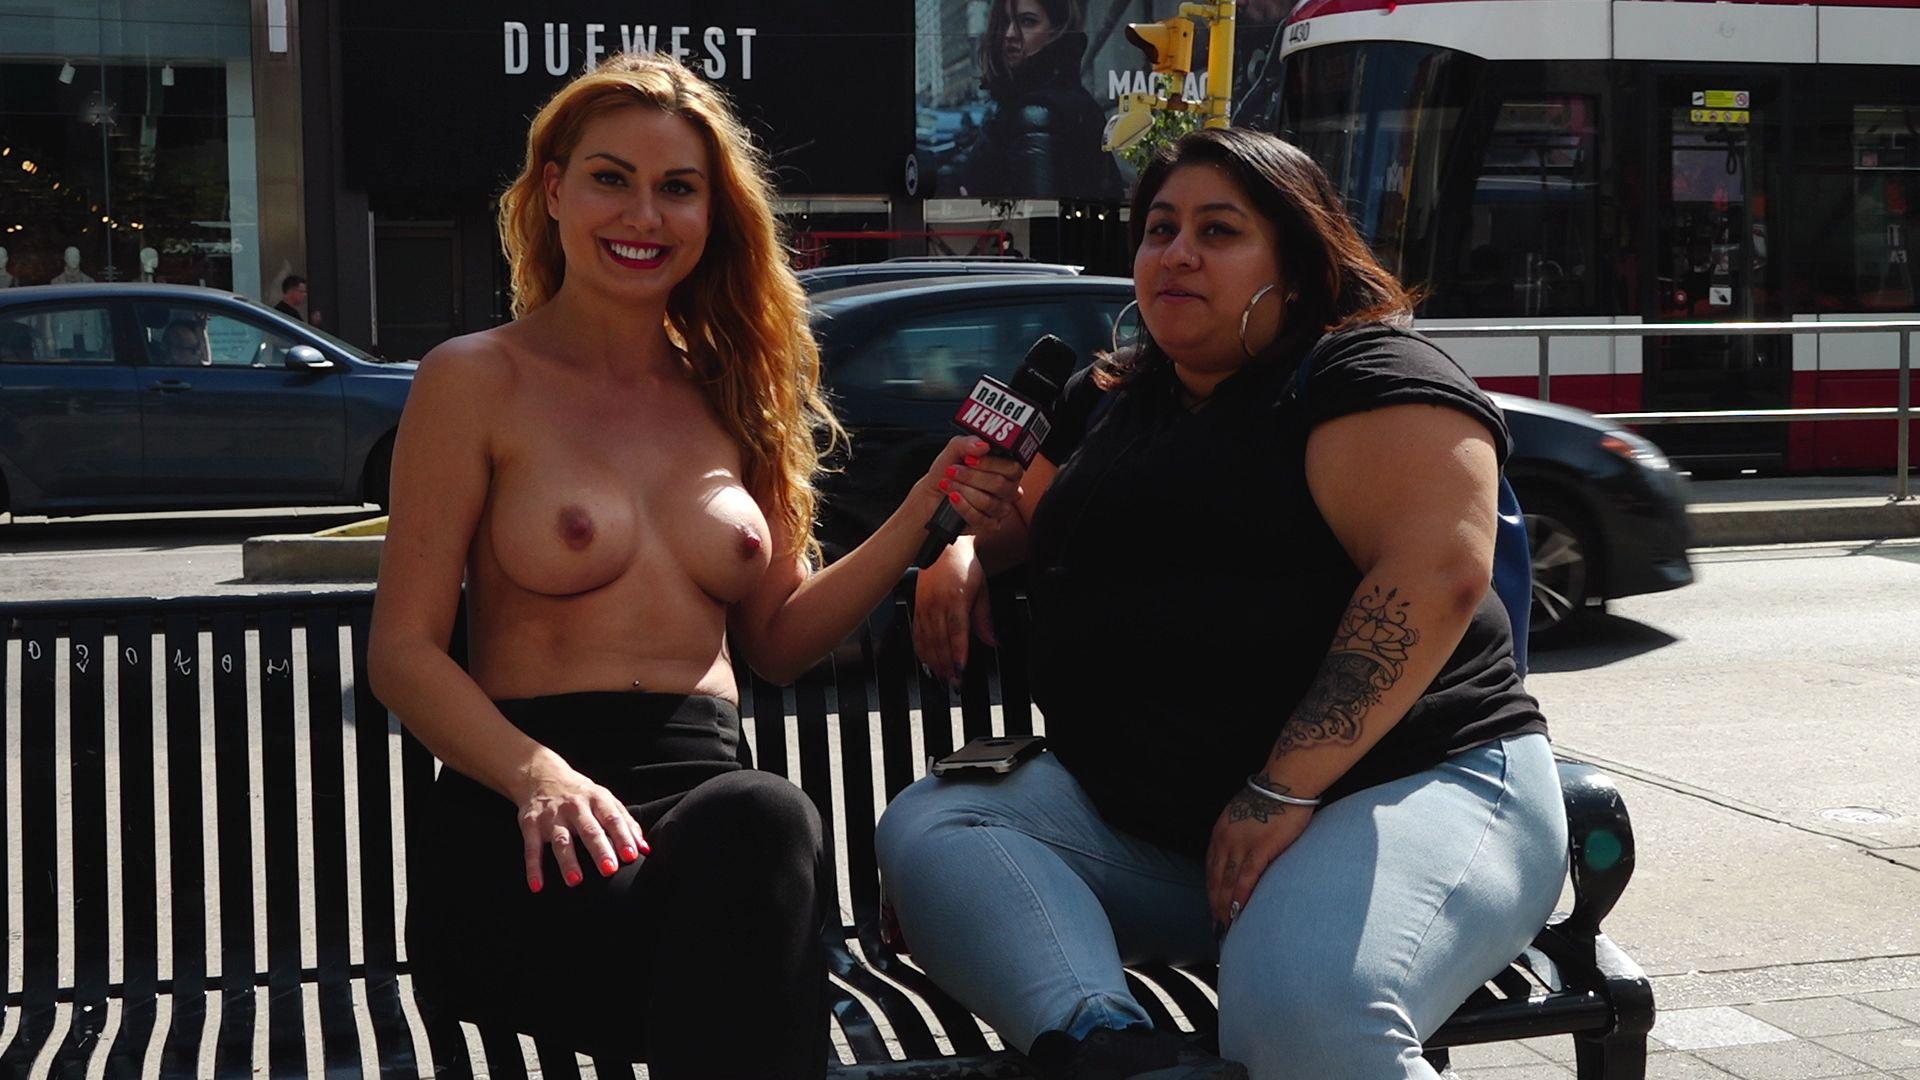 Beautiful Nudes, Hot Naked Females, Naked News, Nude Weather Girls,